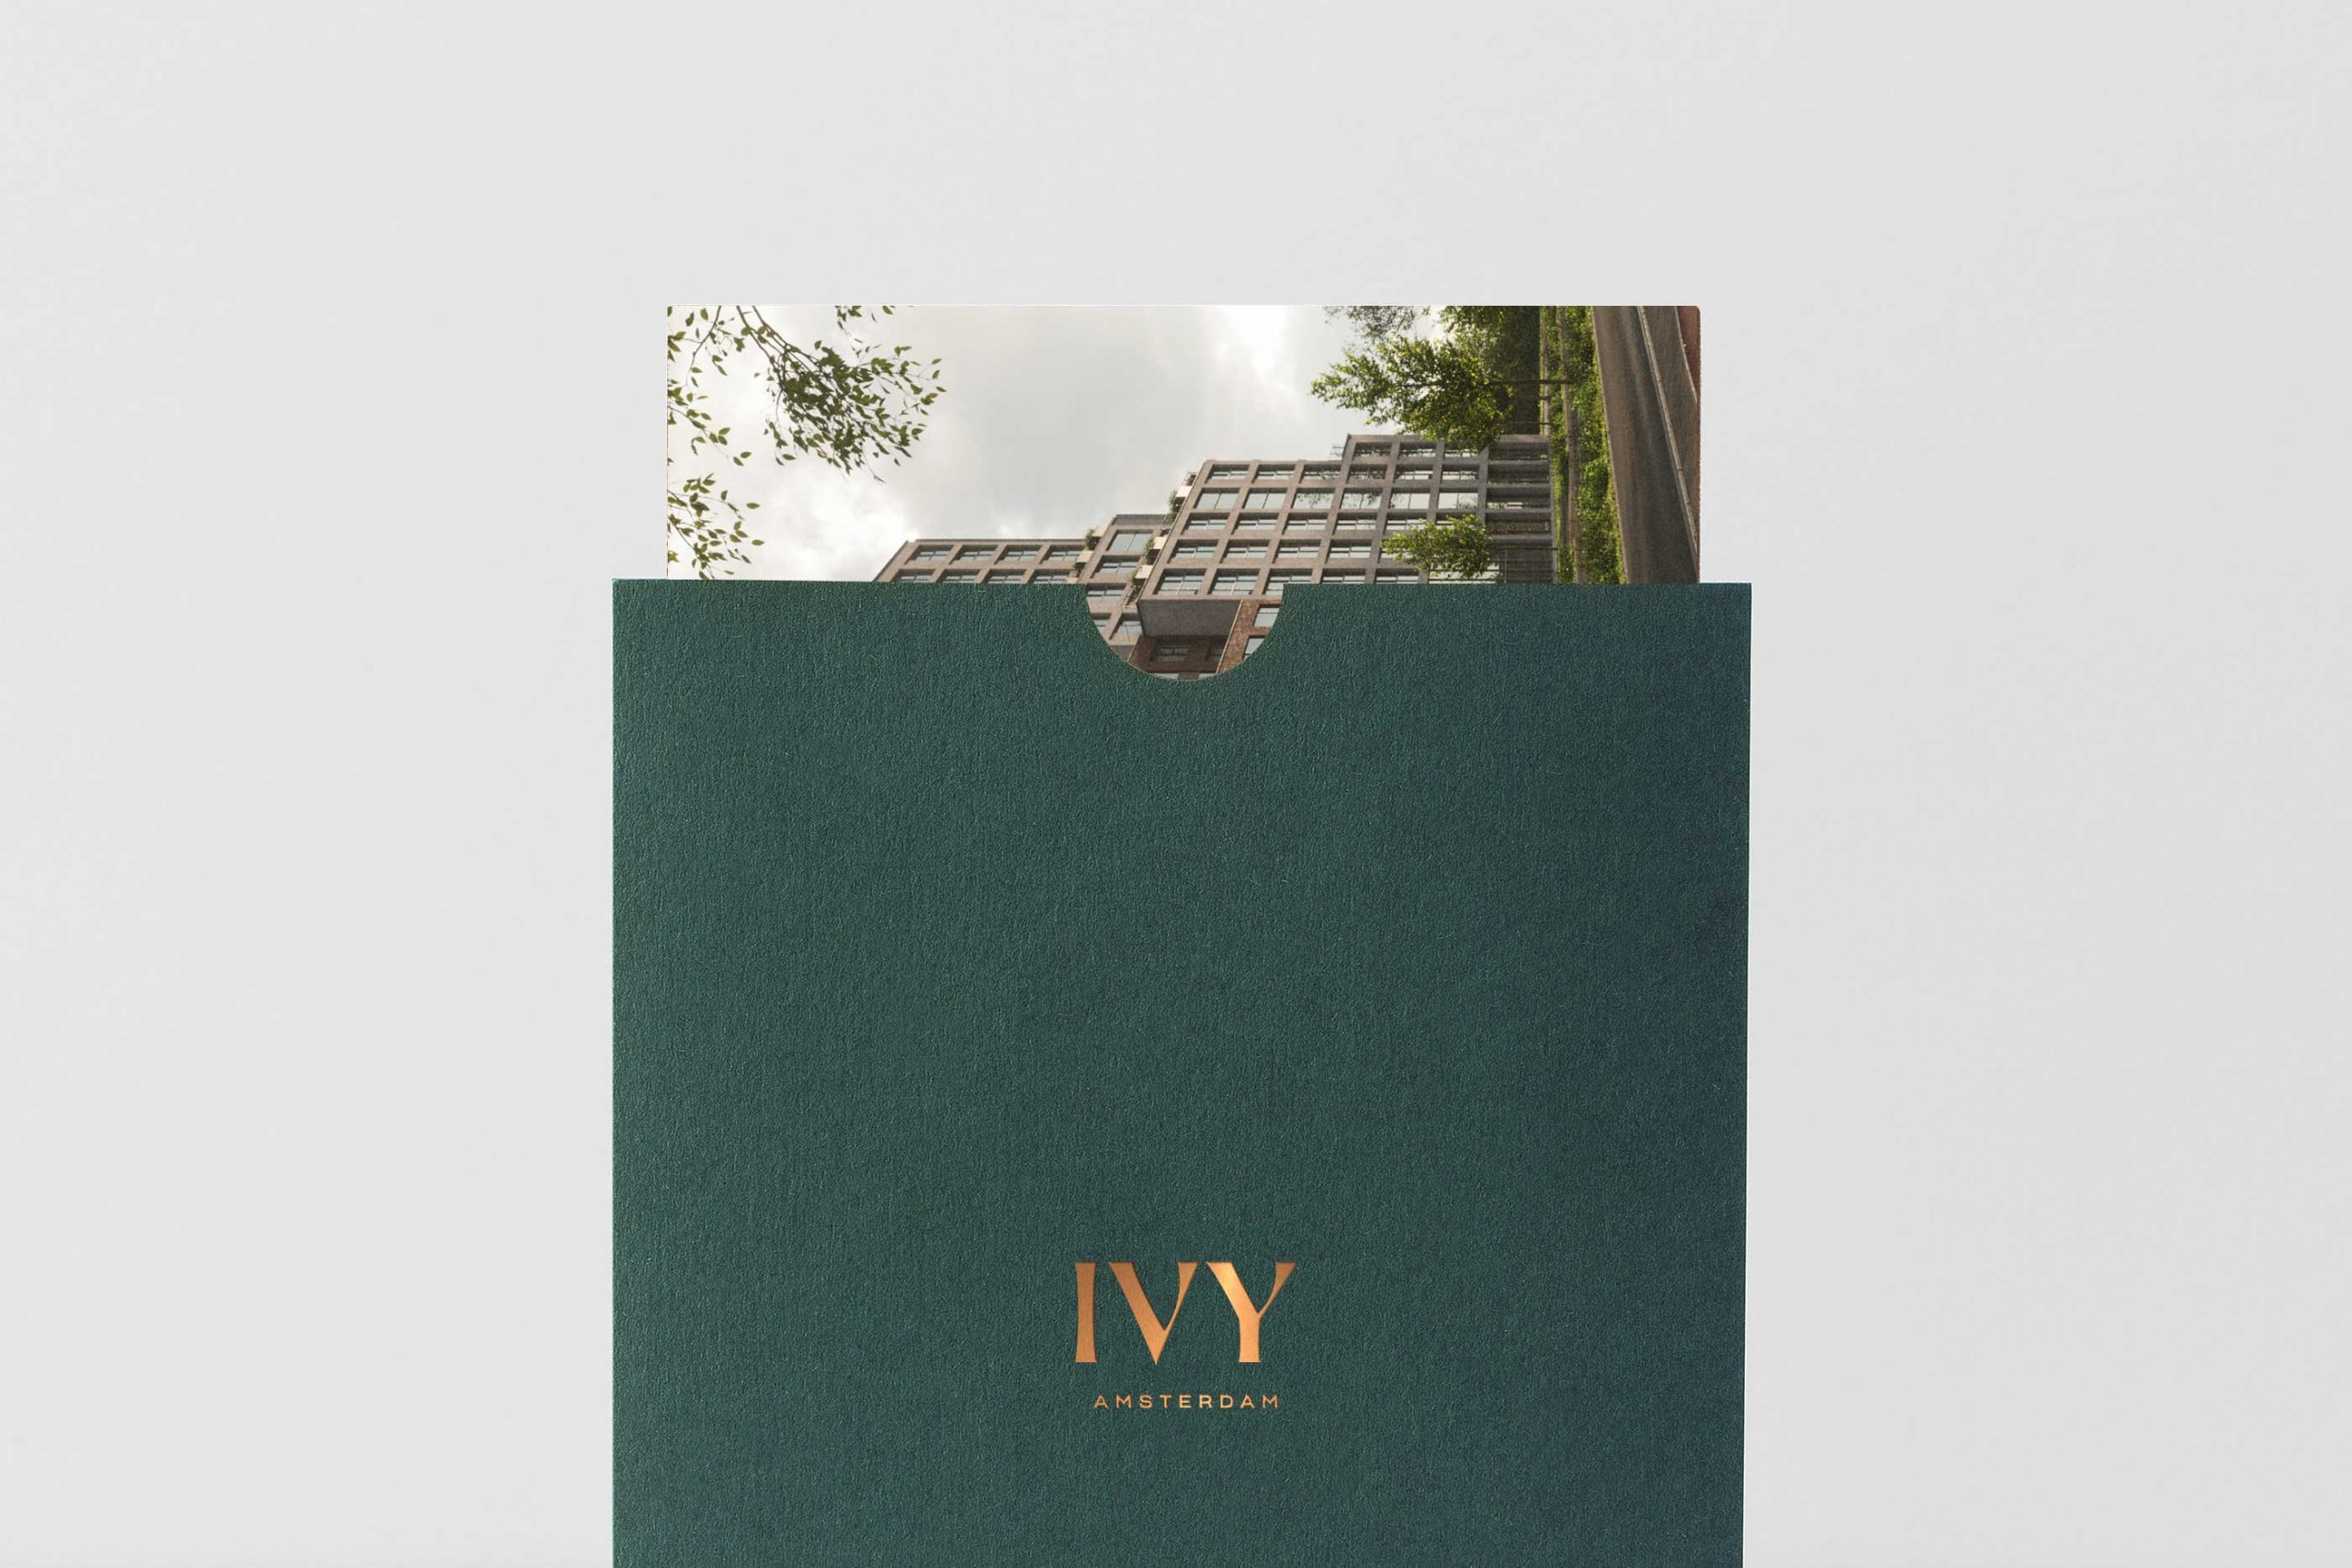 21-IVY-Amsterdam